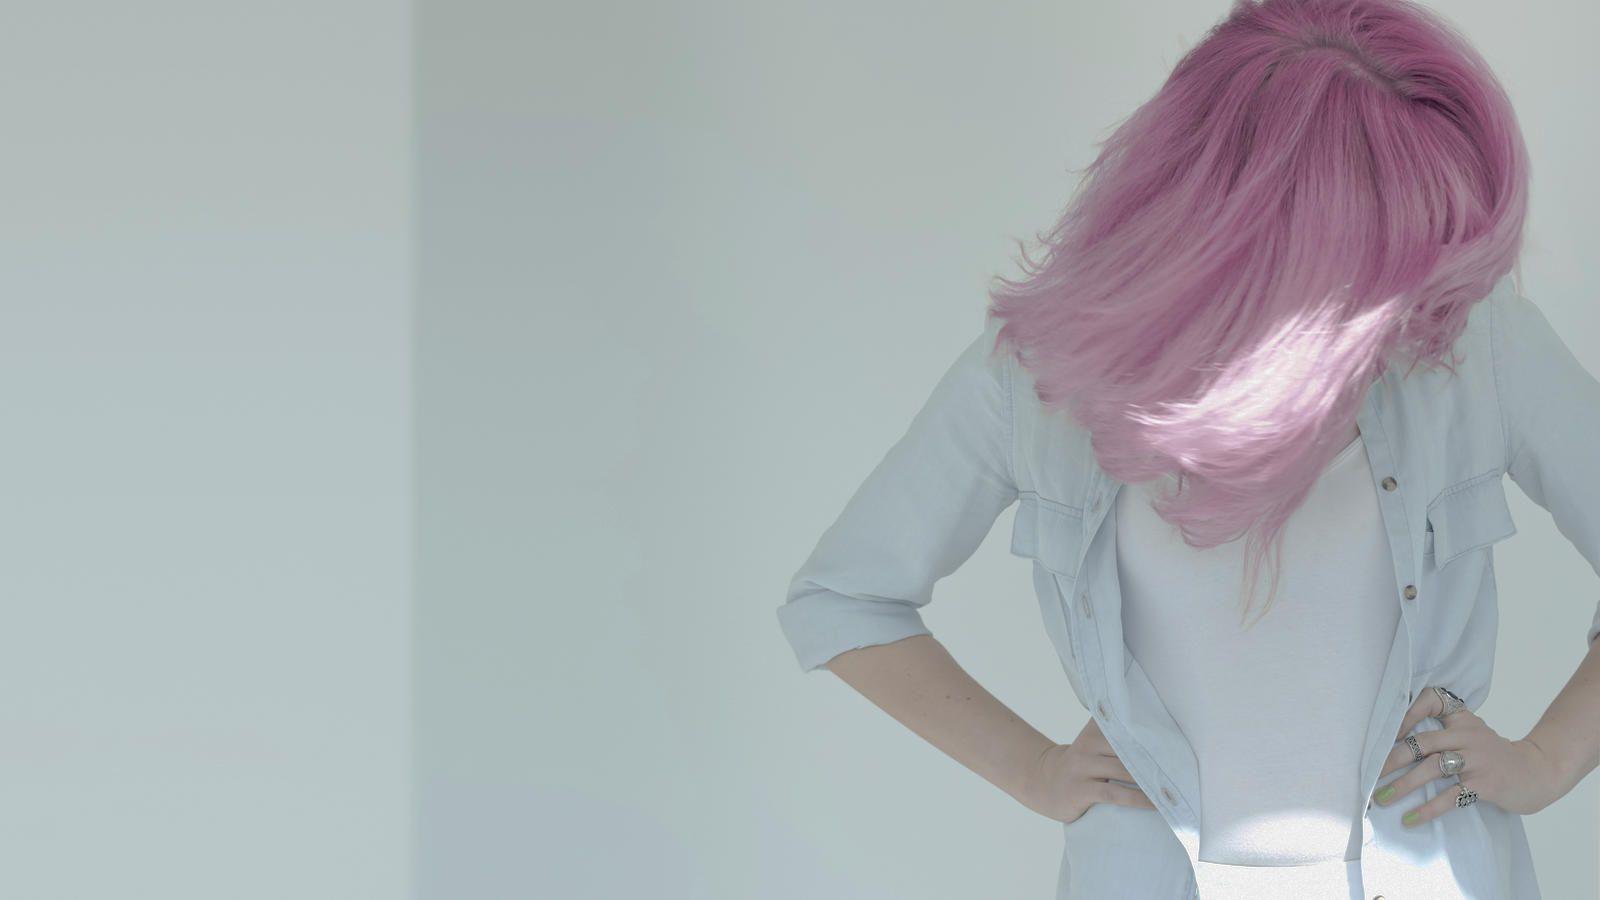 Rosa Haare Farben So Gelingt Der Angesagte Pastell Look